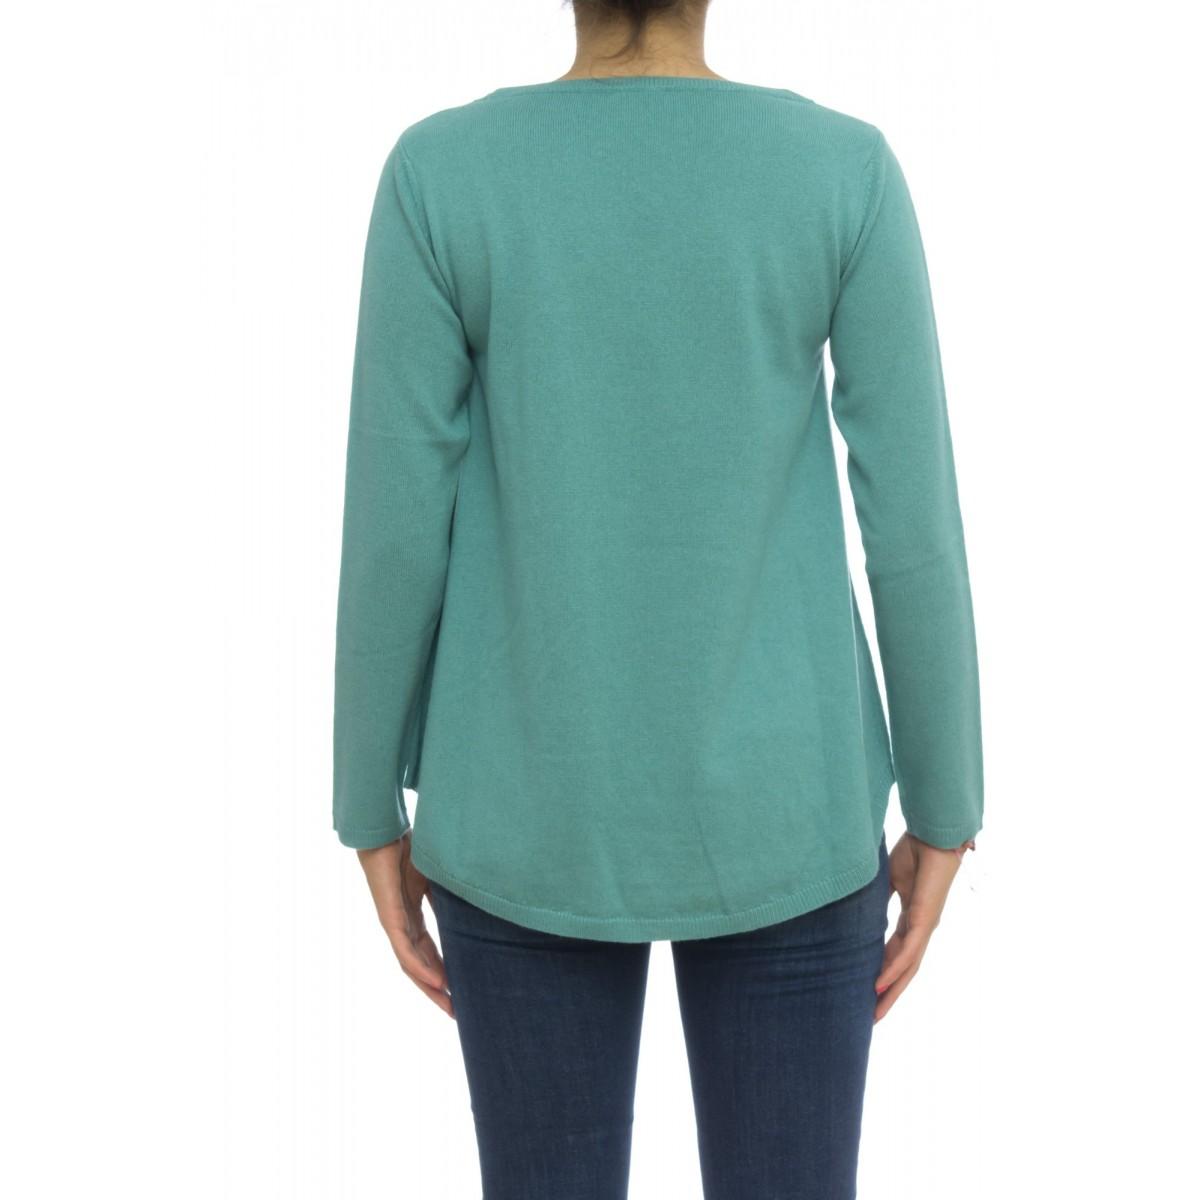 Sweater Woman- 6505/13